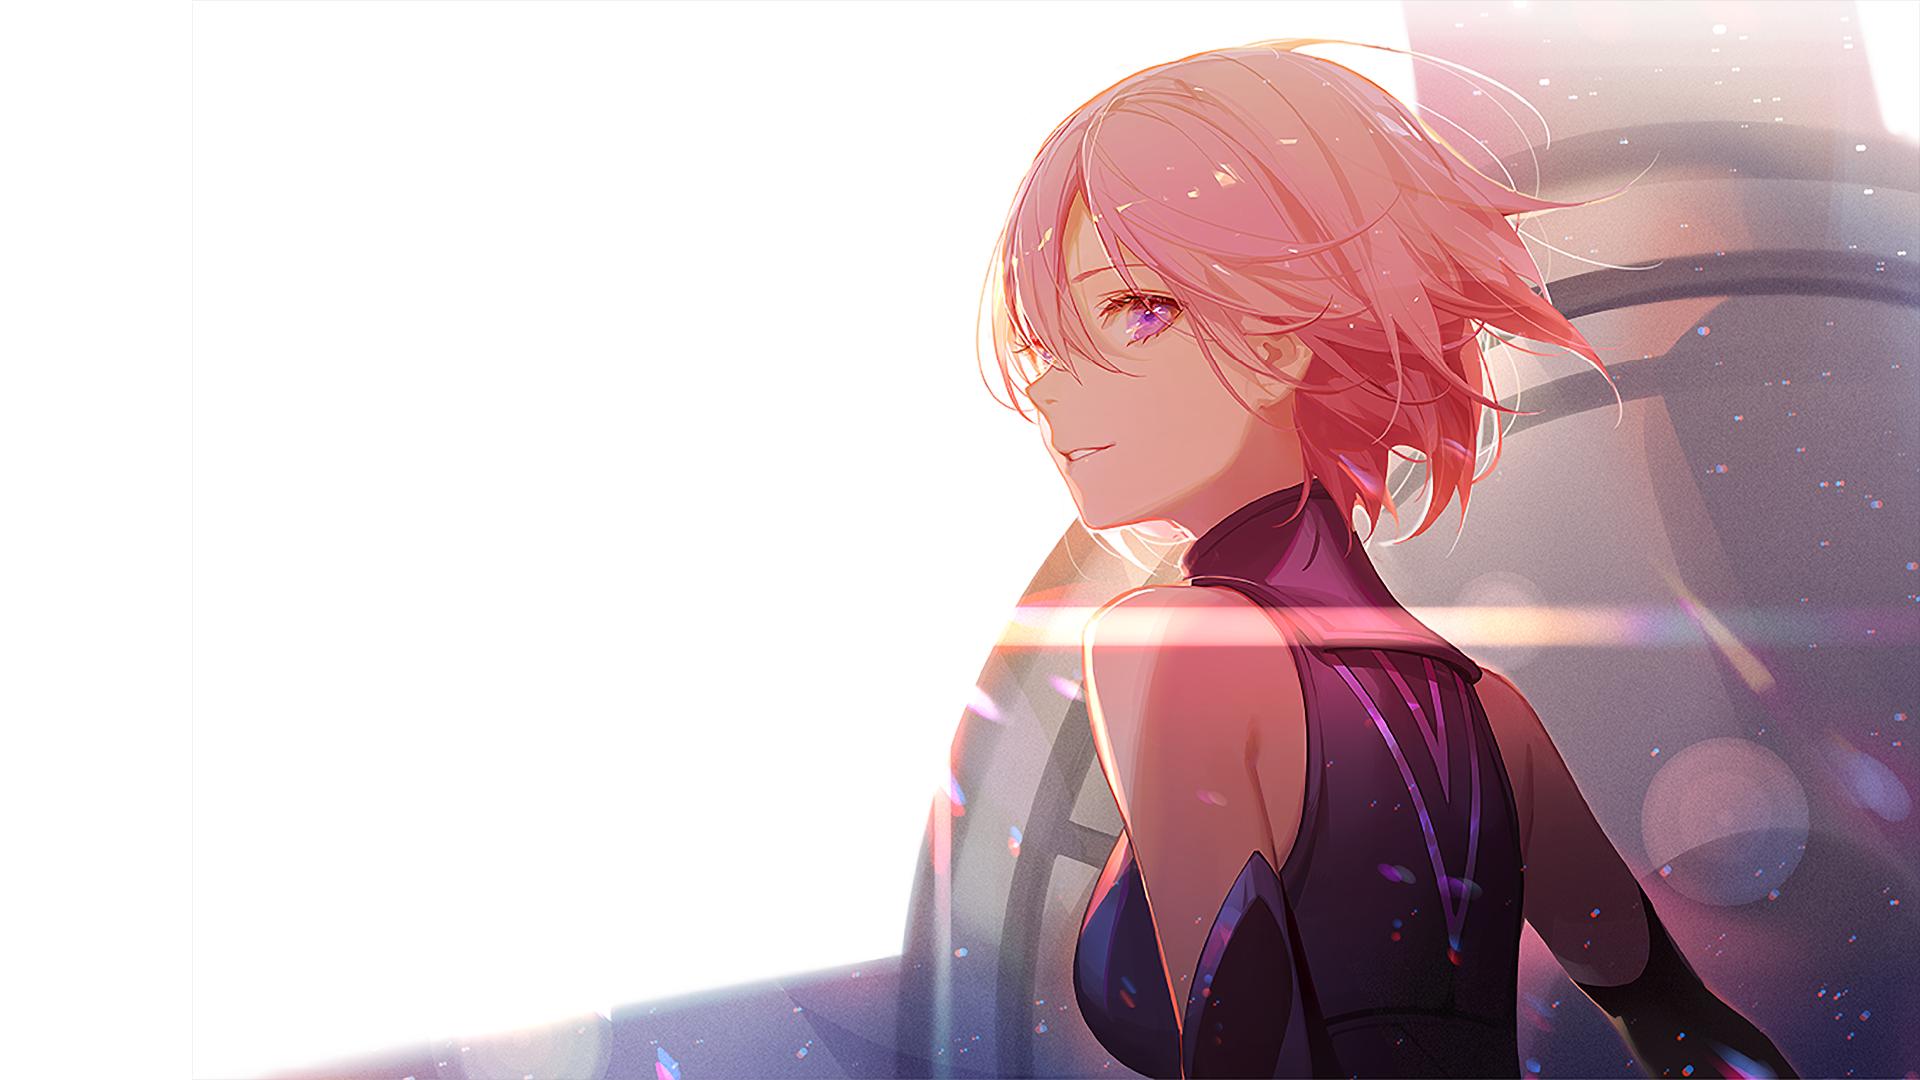 Anime 1920x1080 Fate/Grand Order anime anime girls Shielder (Fate/Grand Order) Fate Series pink hair ASK (artist)